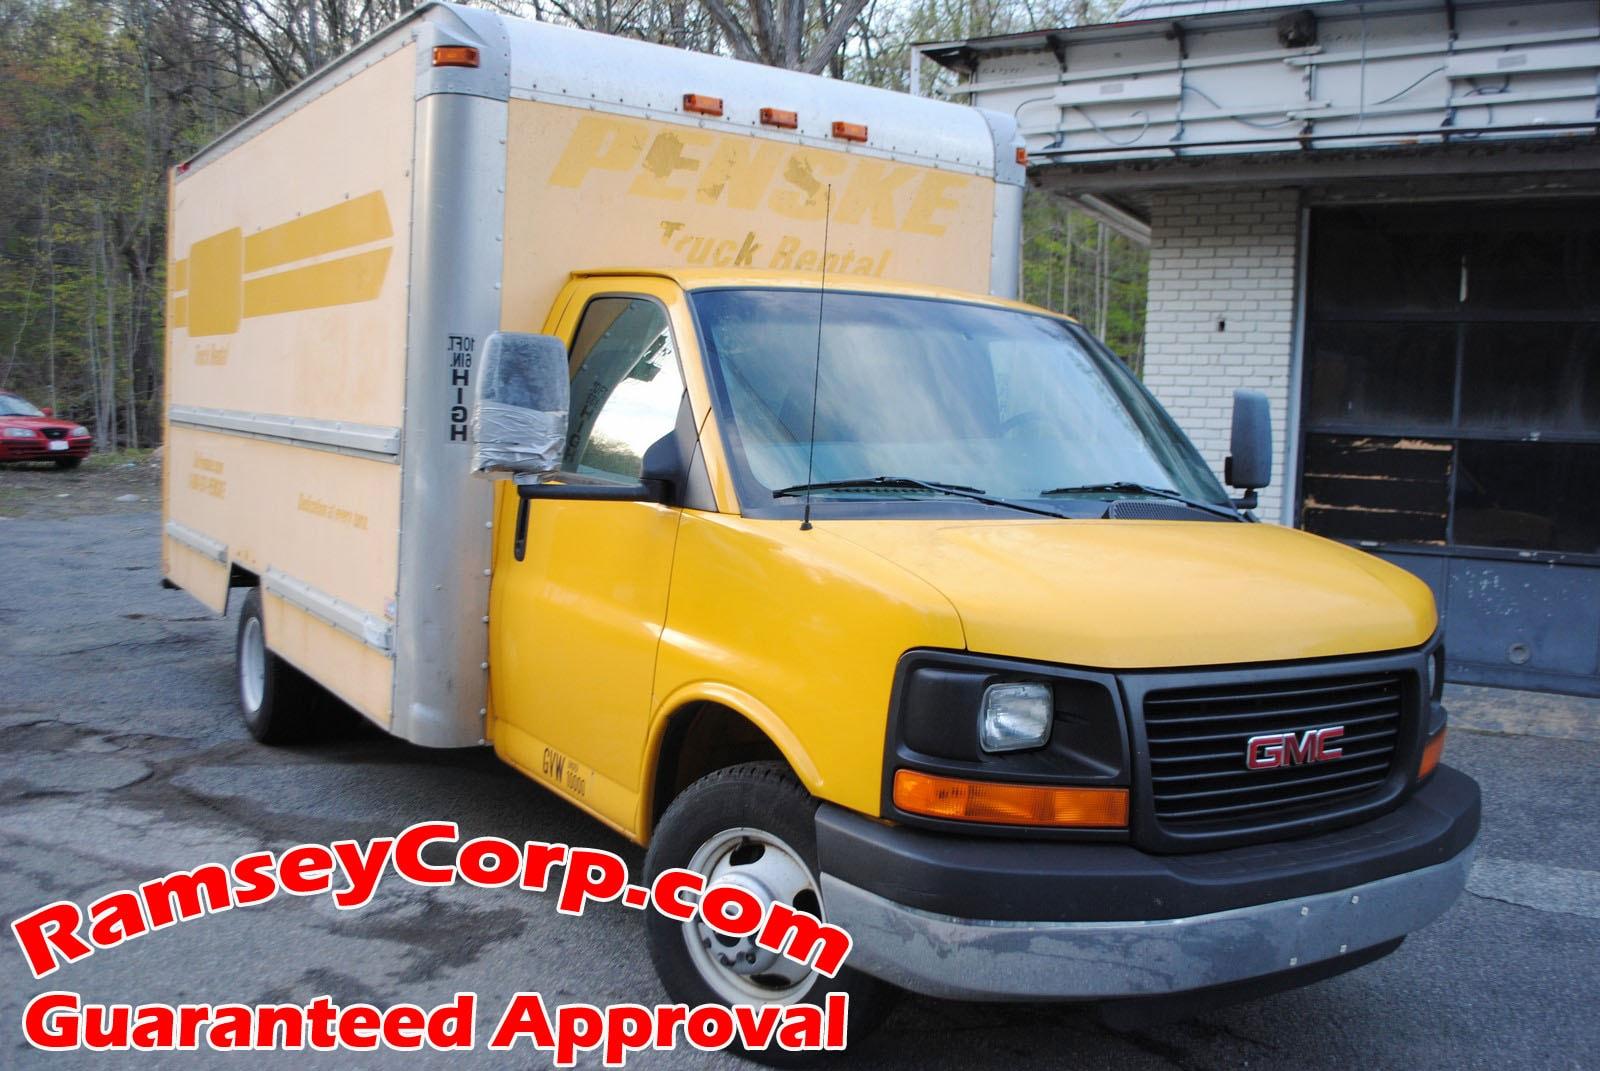 used 2006 gmc savana cutaway for sale west milford nj rh ramseycorp com 2006 GMC Savana Conversion Van 2009 GMC Savanna